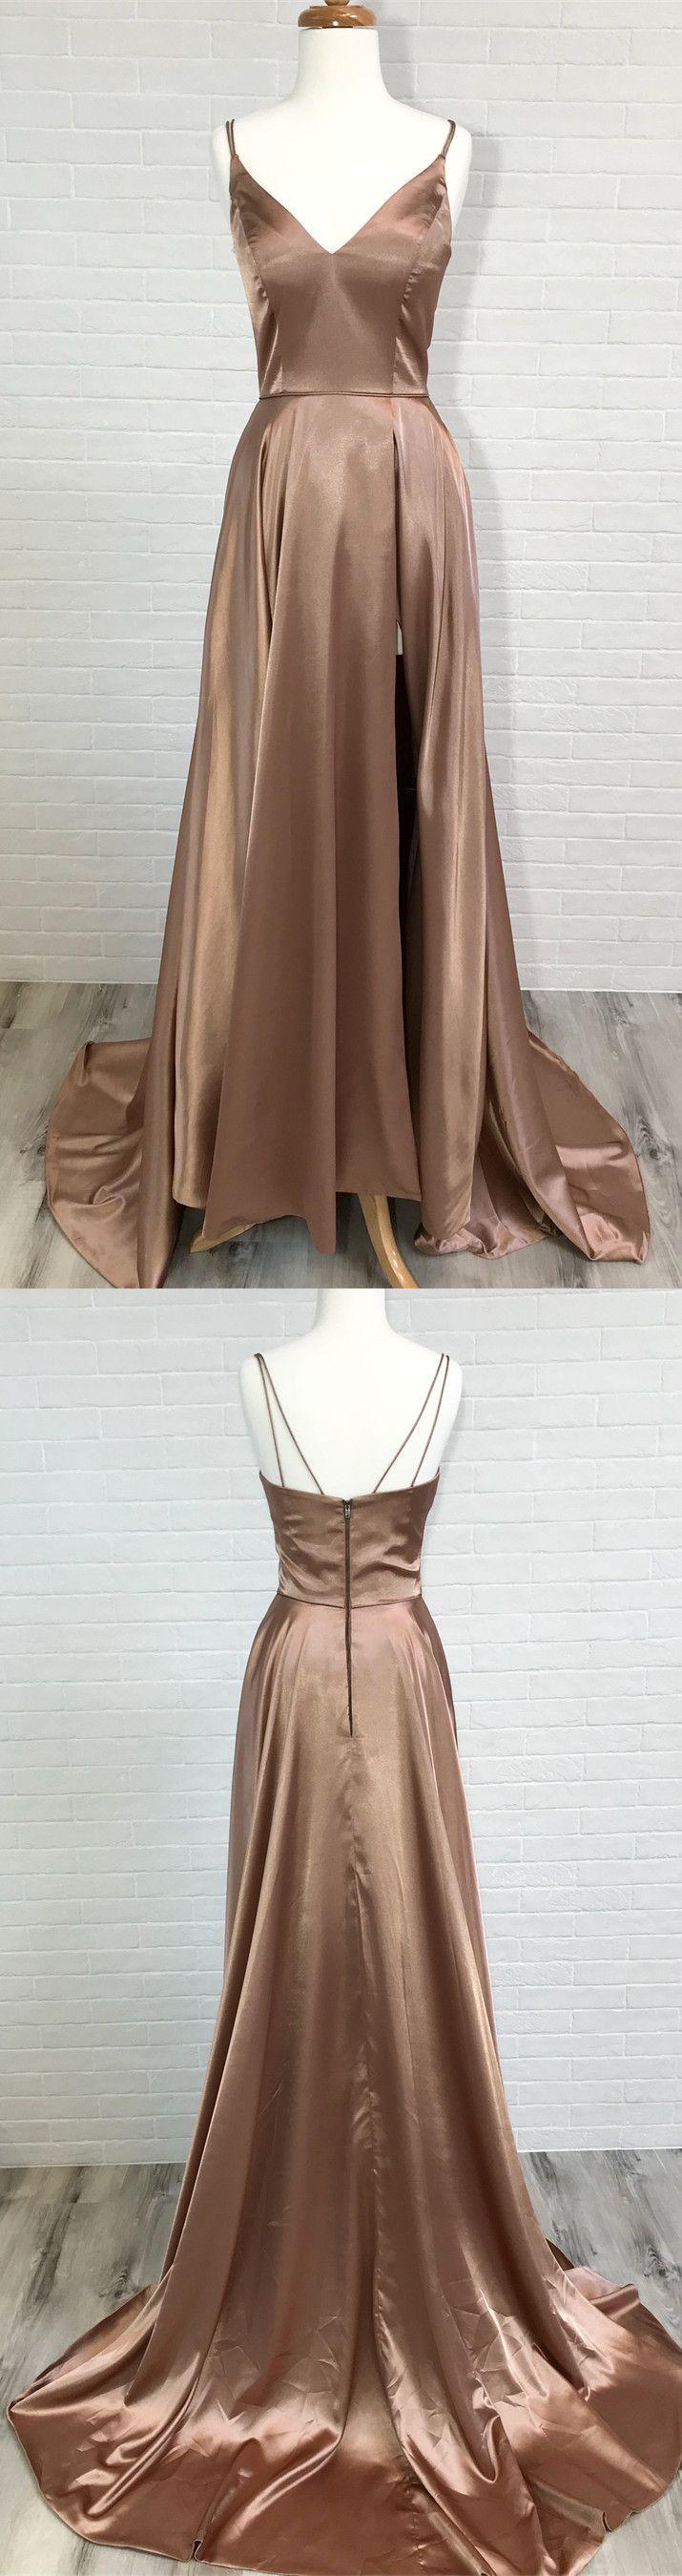 Champagne long prom dress prom dress elegant straps long prom